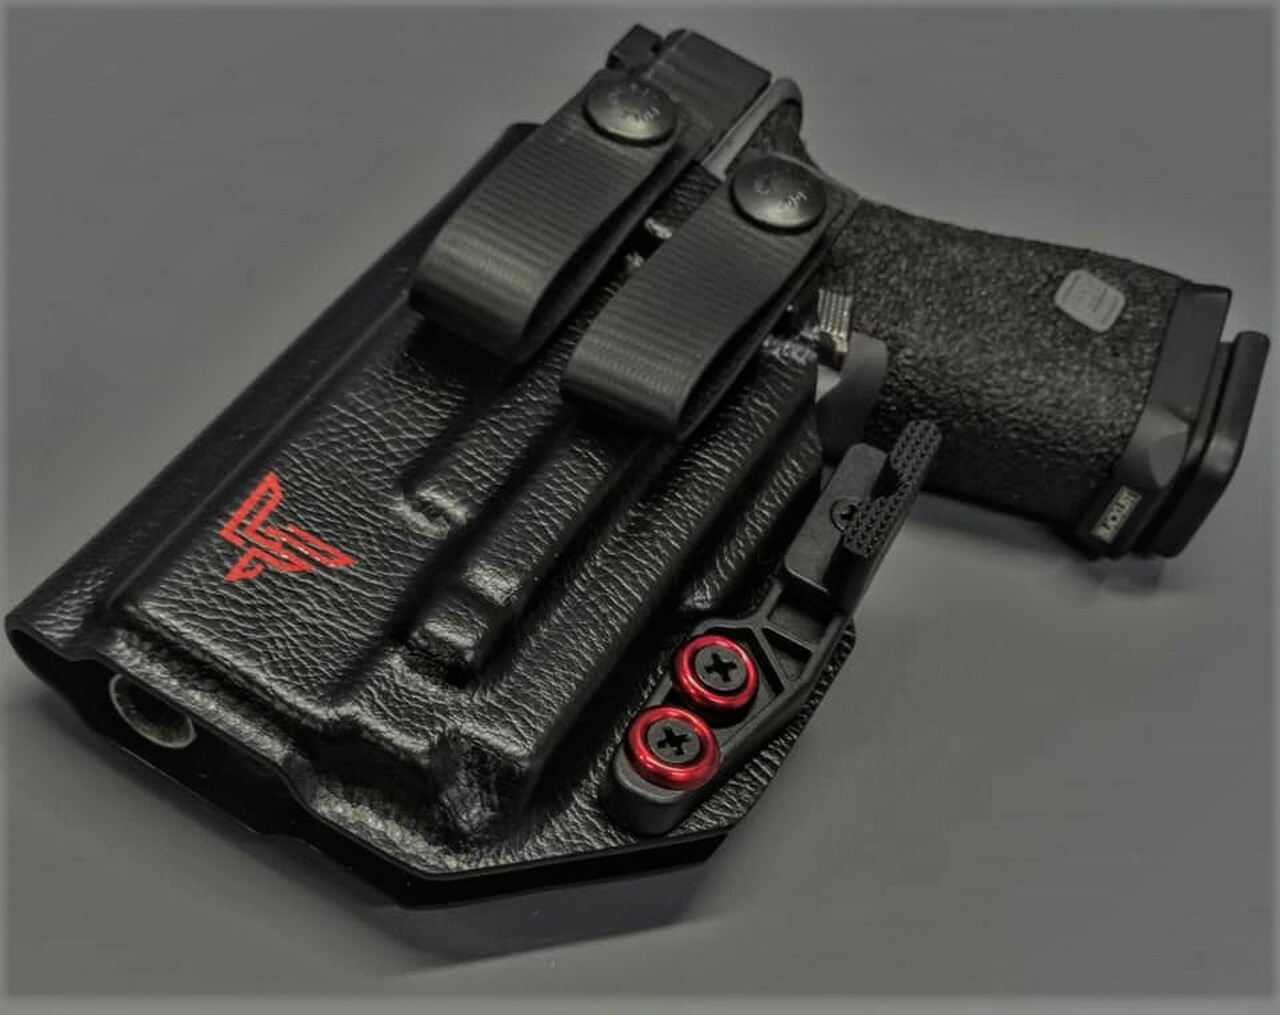 Glock 19 OLight PL Mini Appendix Carry Holster